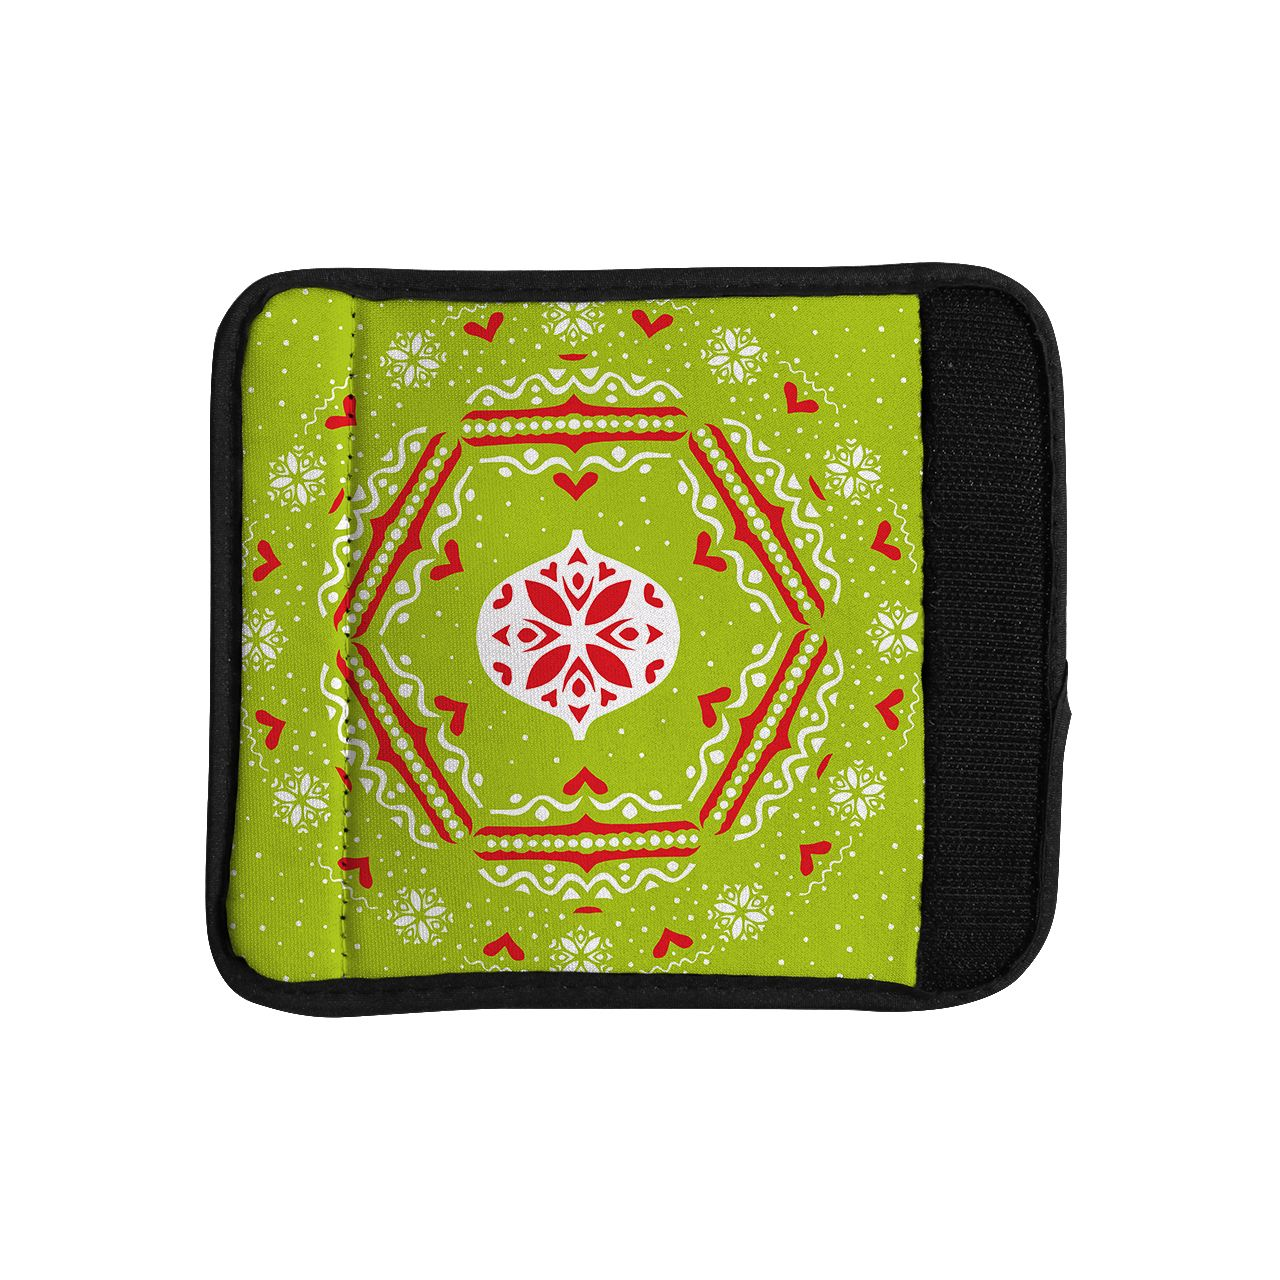 Kess InHouse Miranda Mol 'Snowjoy ' Red Luggage Handle Wrap